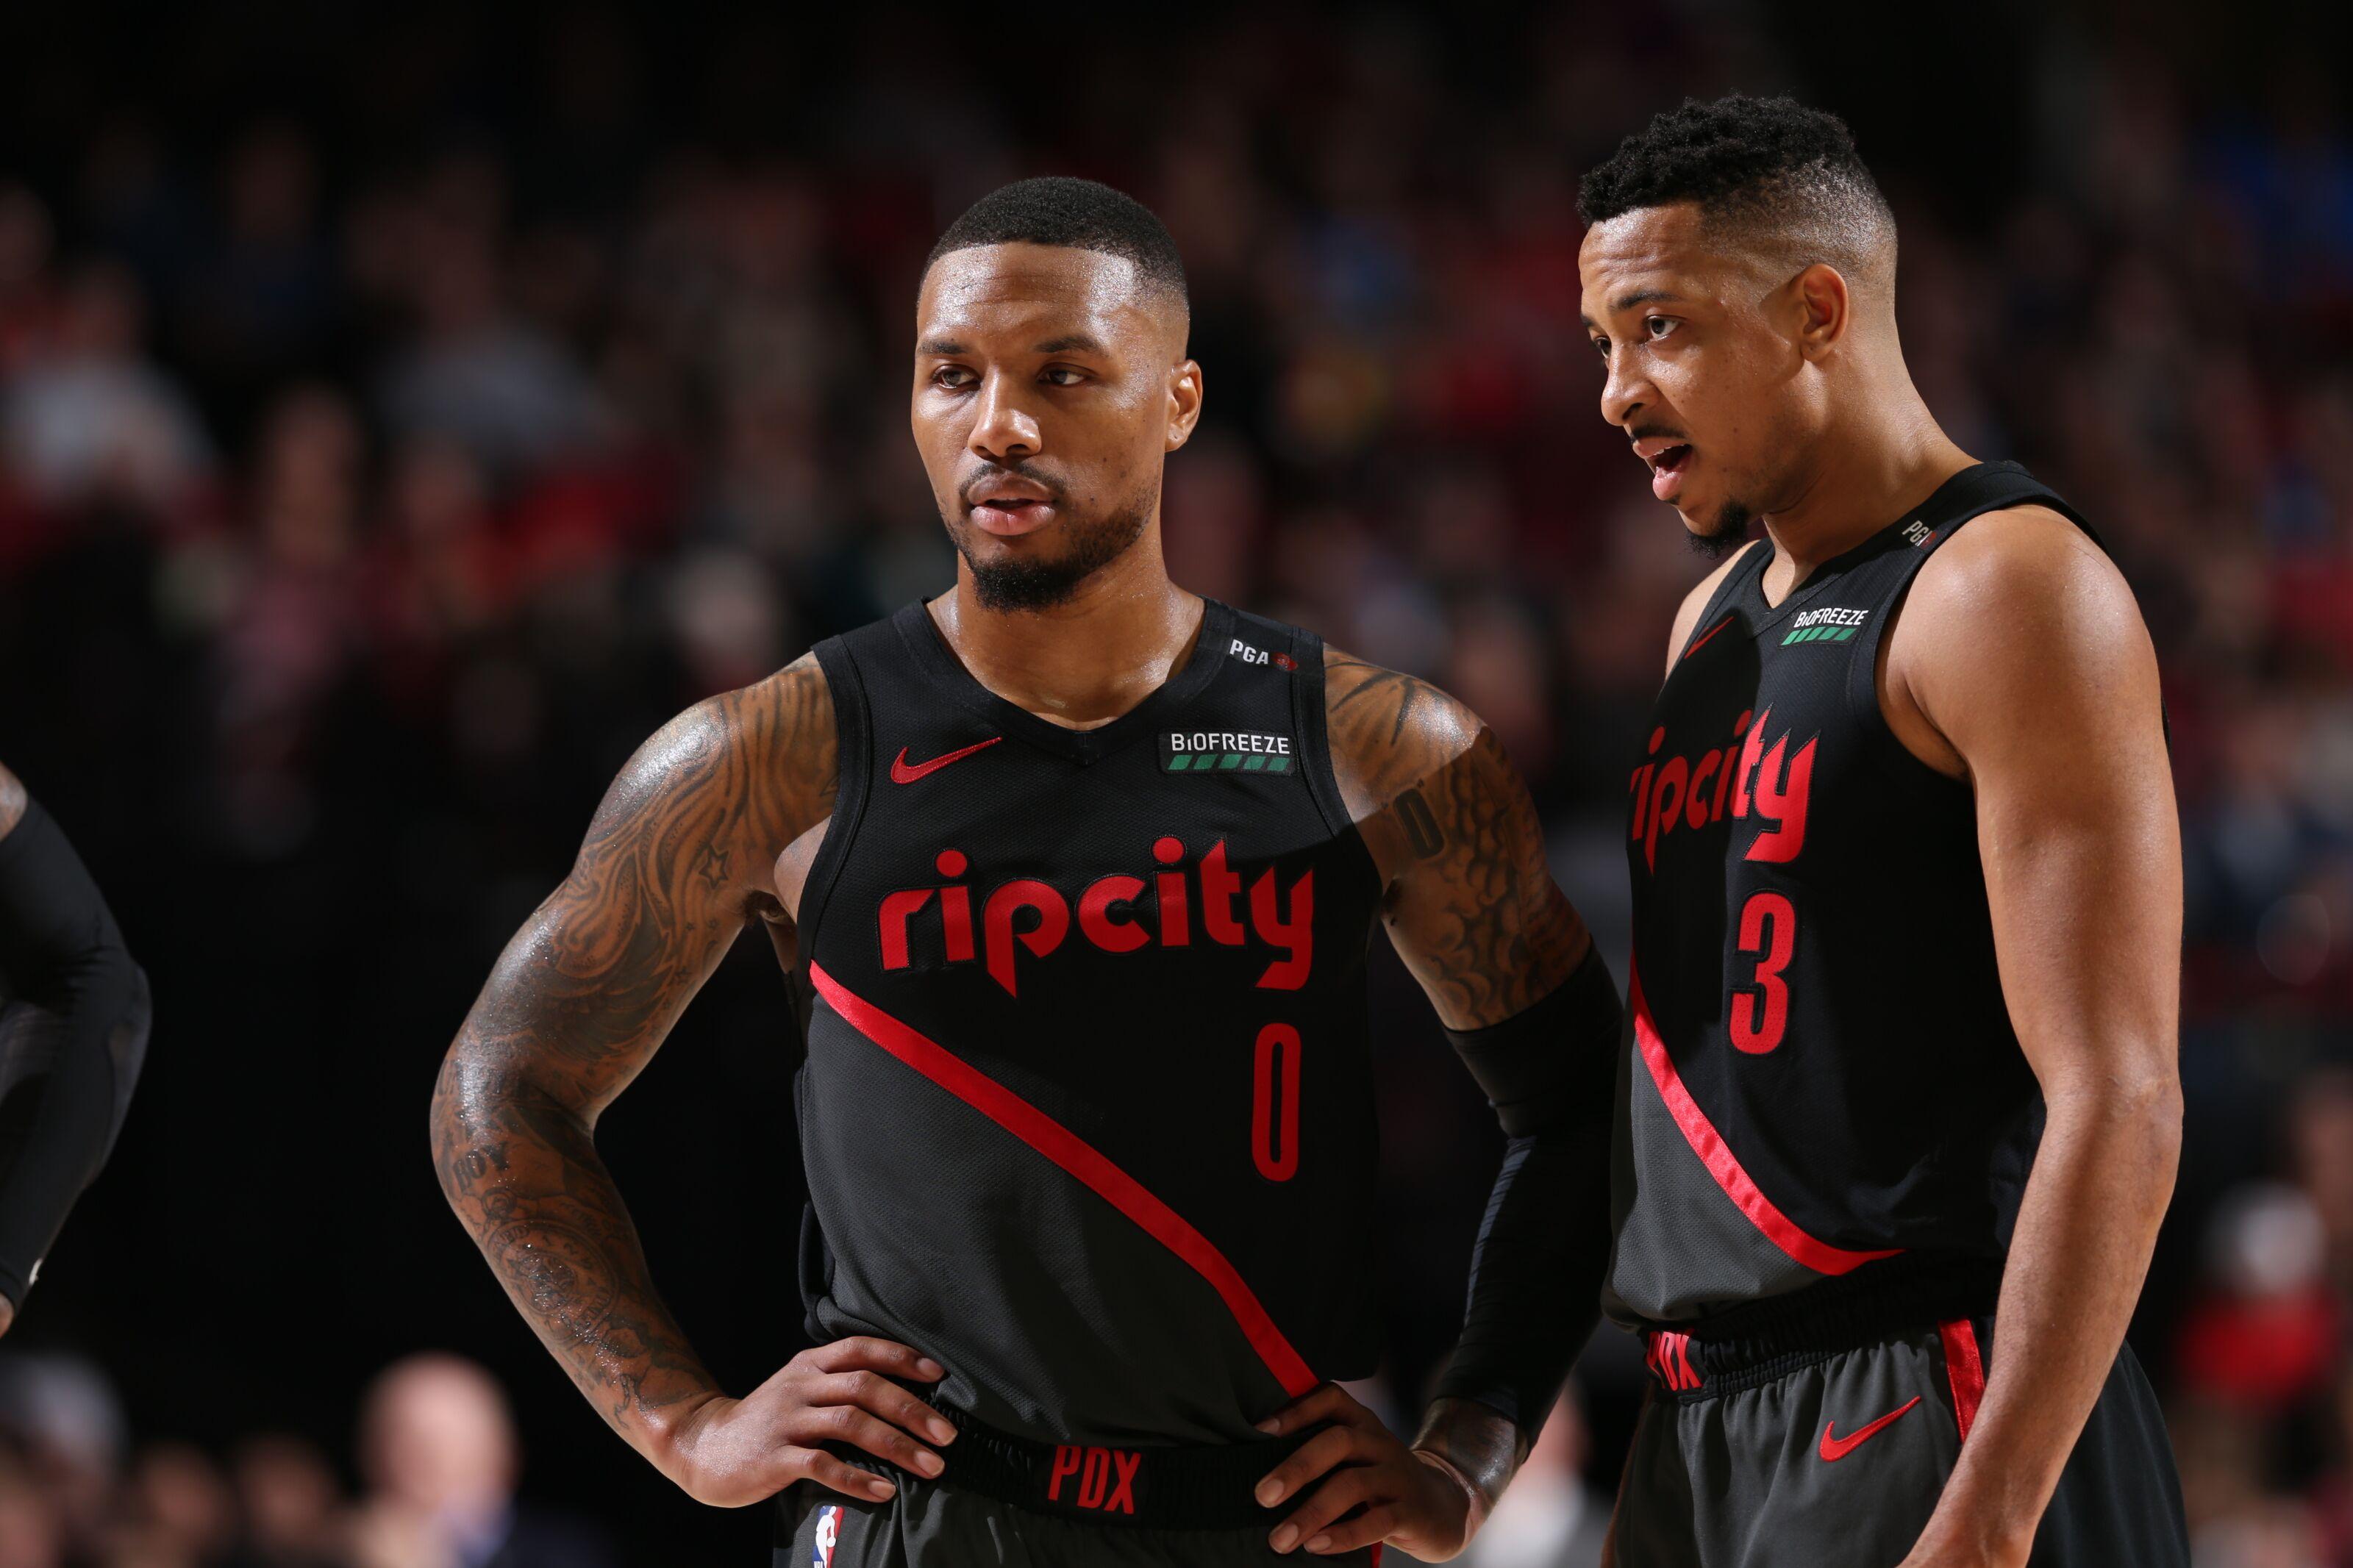 Portland Trail Blazers backcourt receive high ratings in NBA 2K20